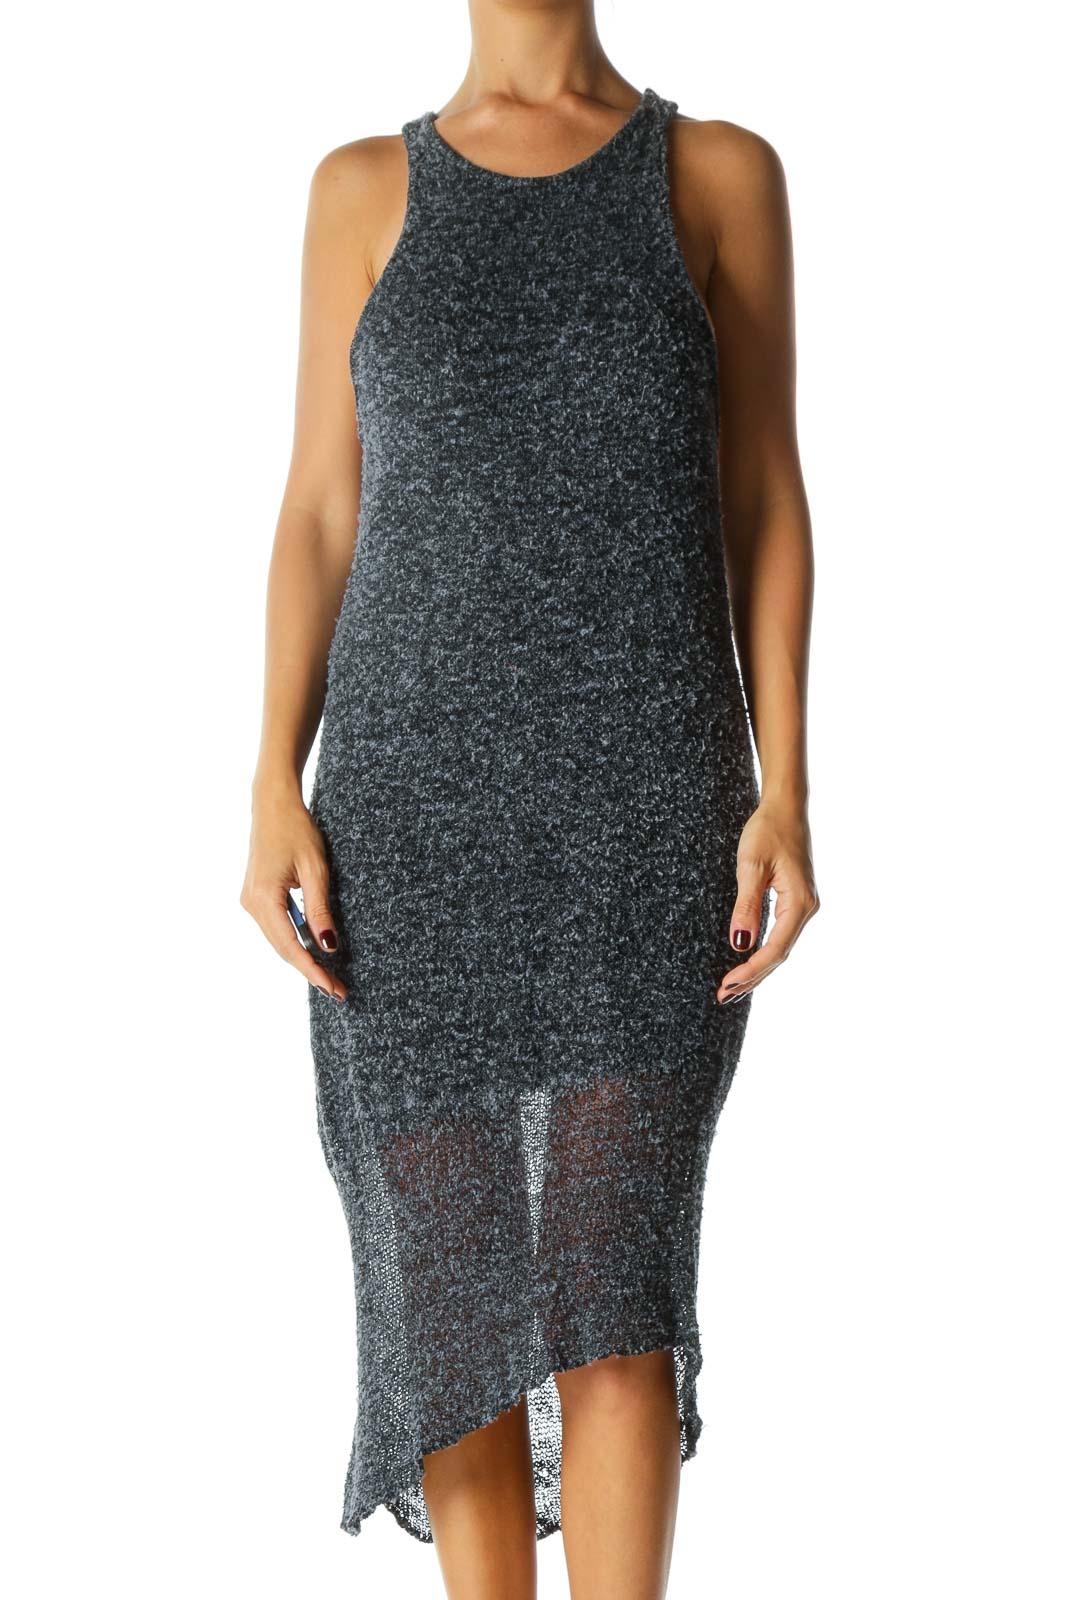 Black Blue Mottled Texture Round Neck Knitted Lining Cotton Silk Blend Dress